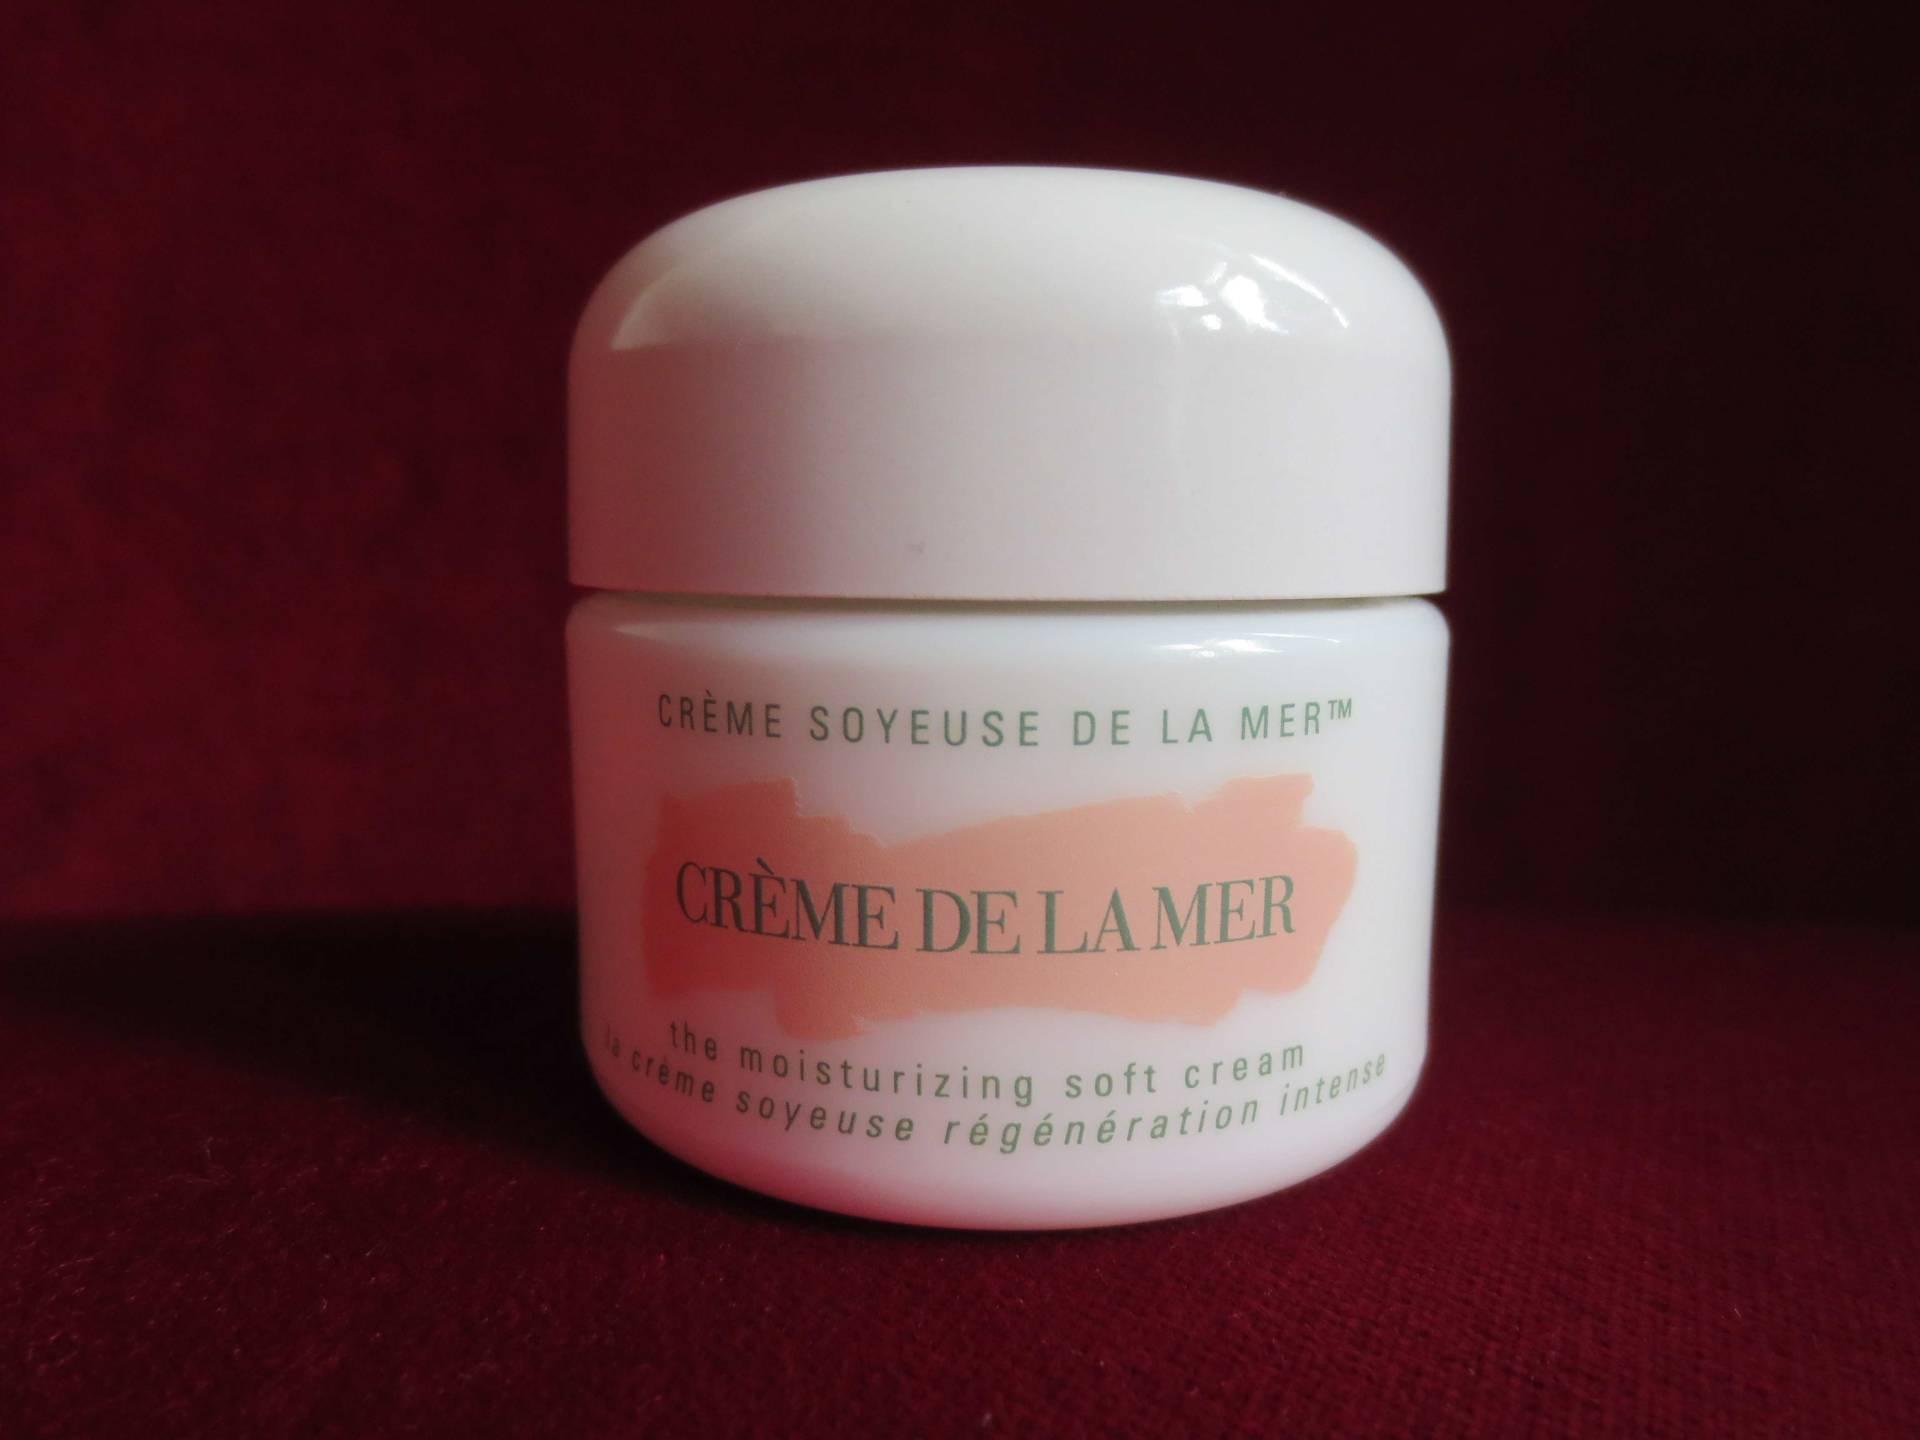 cr me de la mer is it worth the price tag lip balm and hand cream. Black Bedroom Furniture Sets. Home Design Ideas